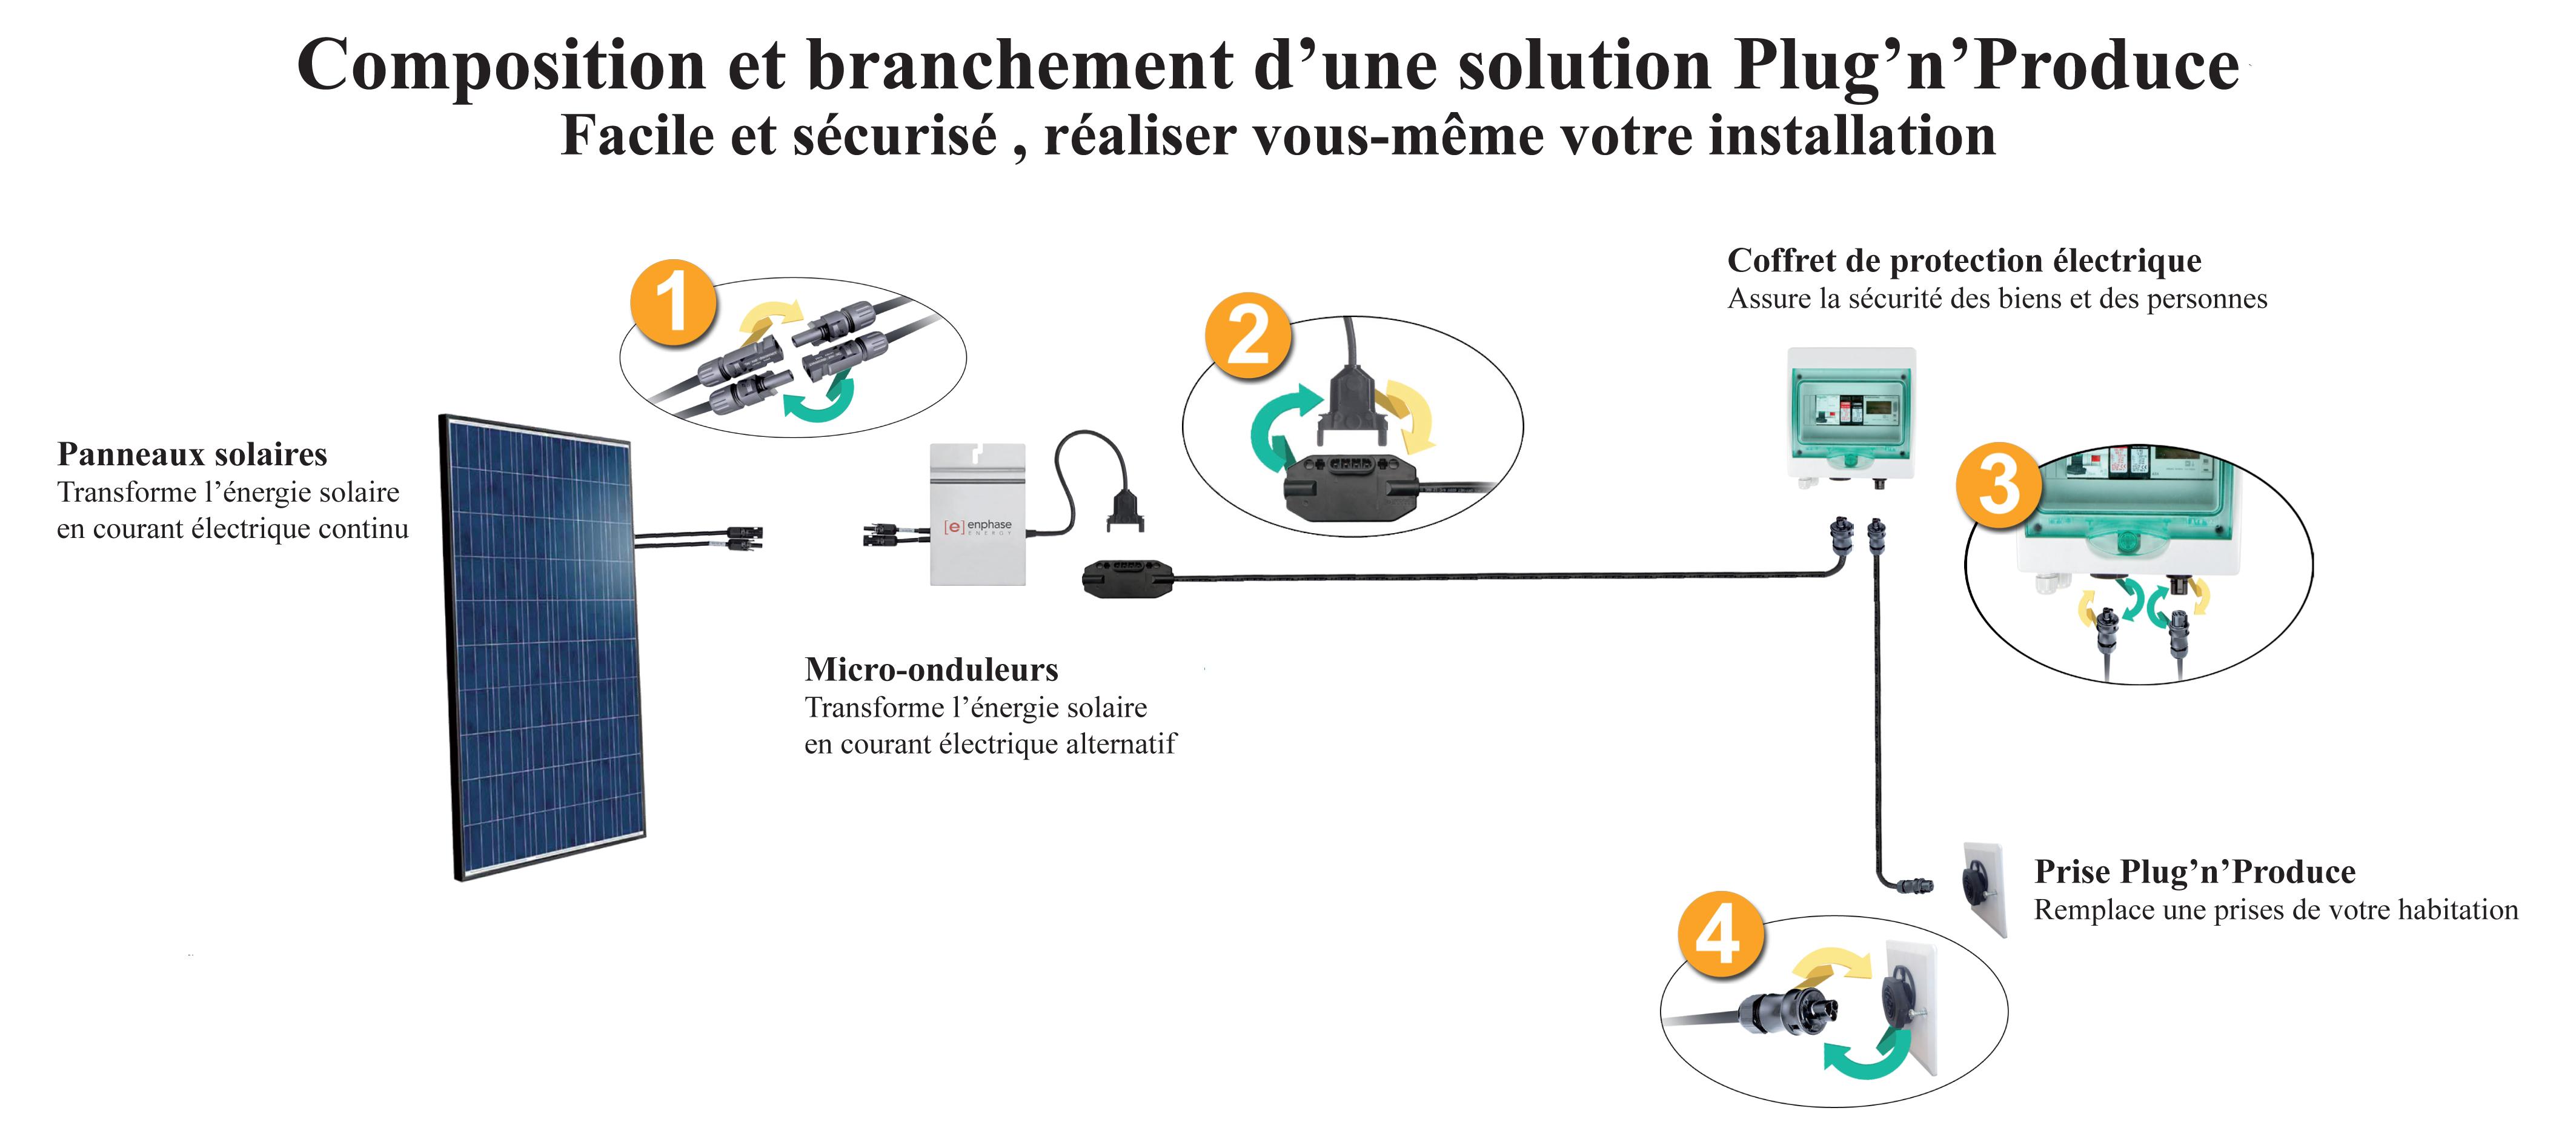 Solution Plug'n'Produce